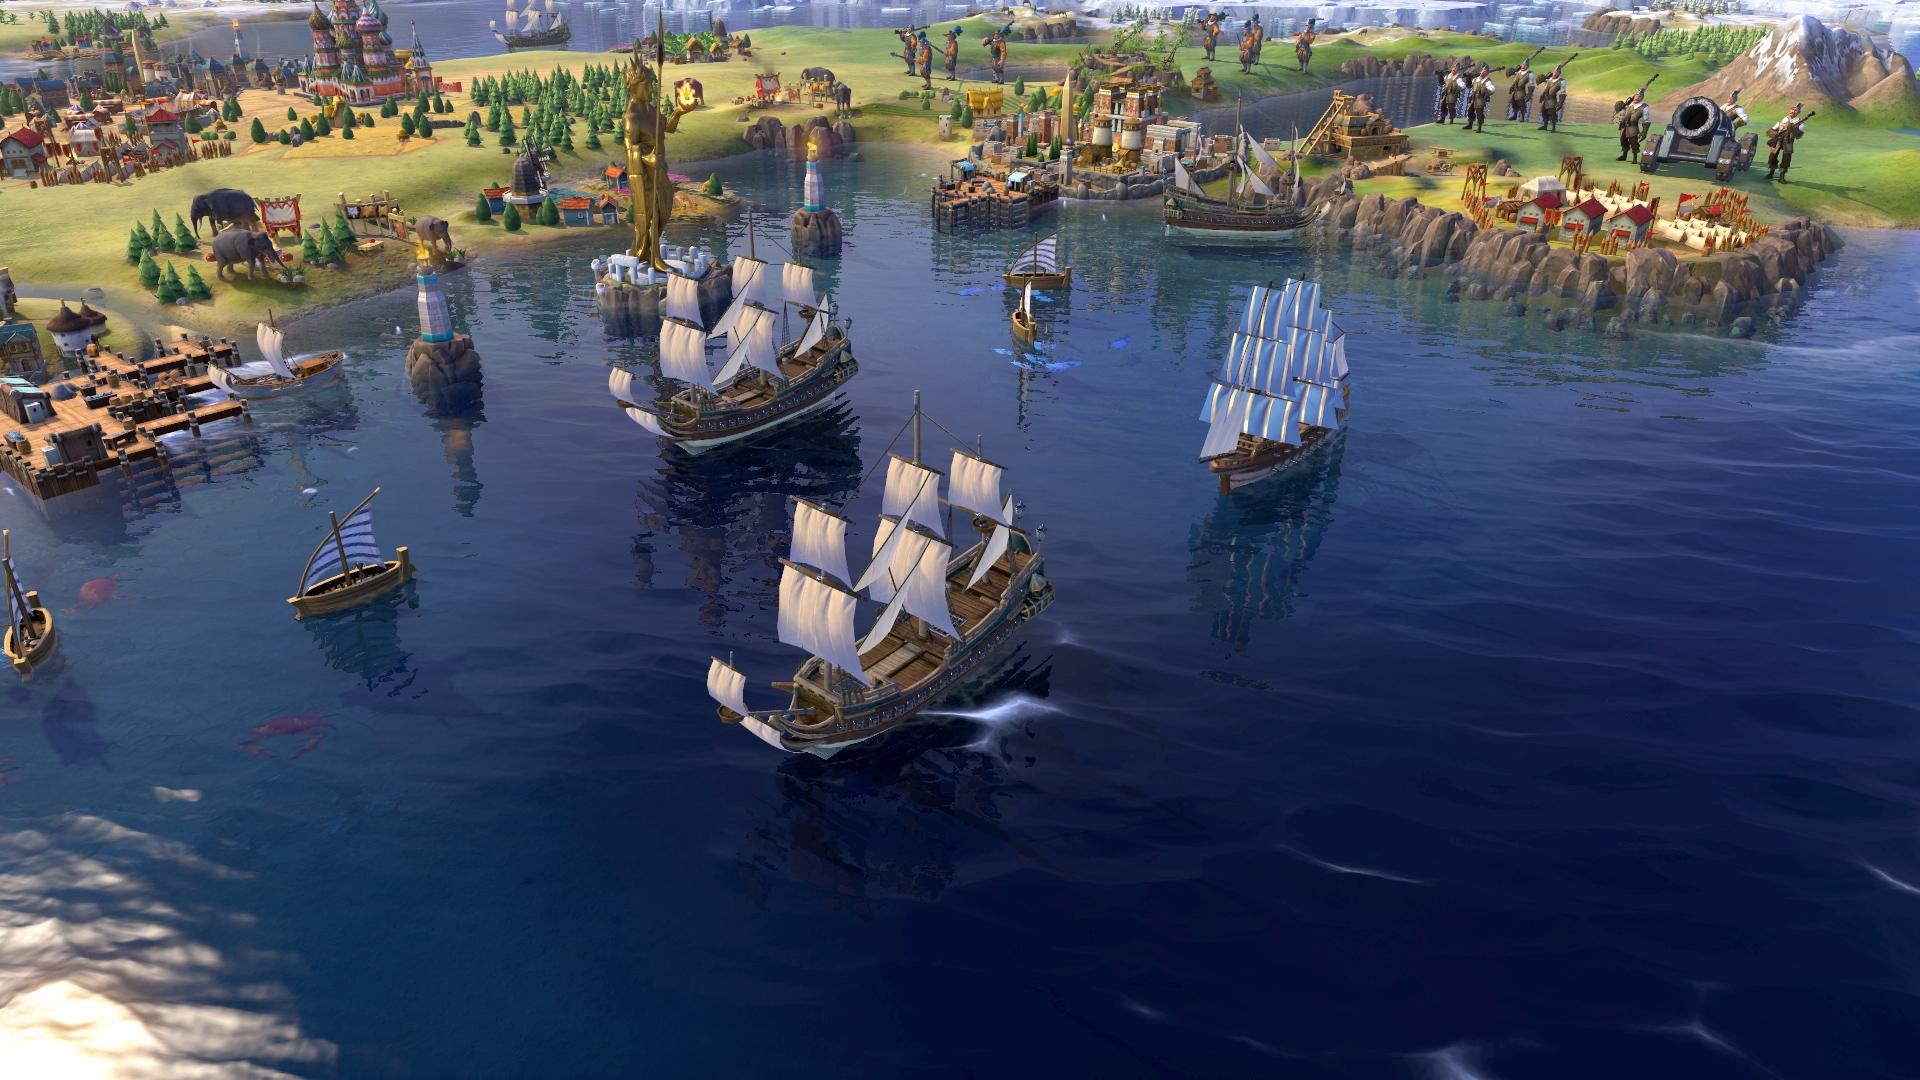 Скриншоты к Sid Meier's Civilization VI [v1.0.0.216] Digital Deluxe + DLC Rise and Fall на русском